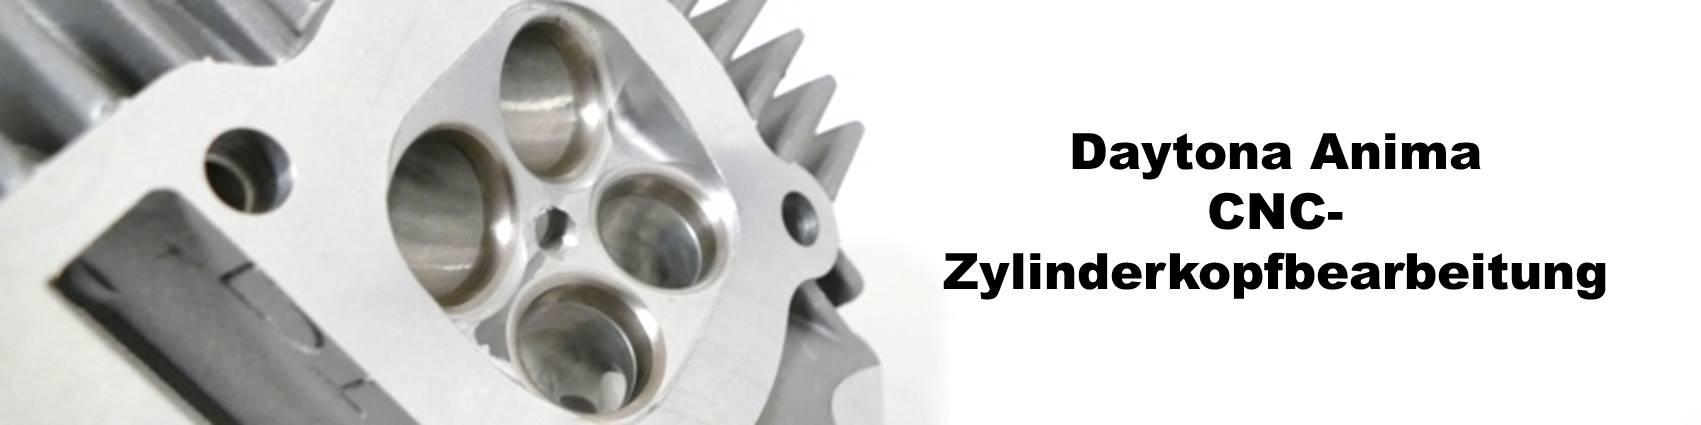 Daytona Anima CNC-Zylinderkopfbearbeitung